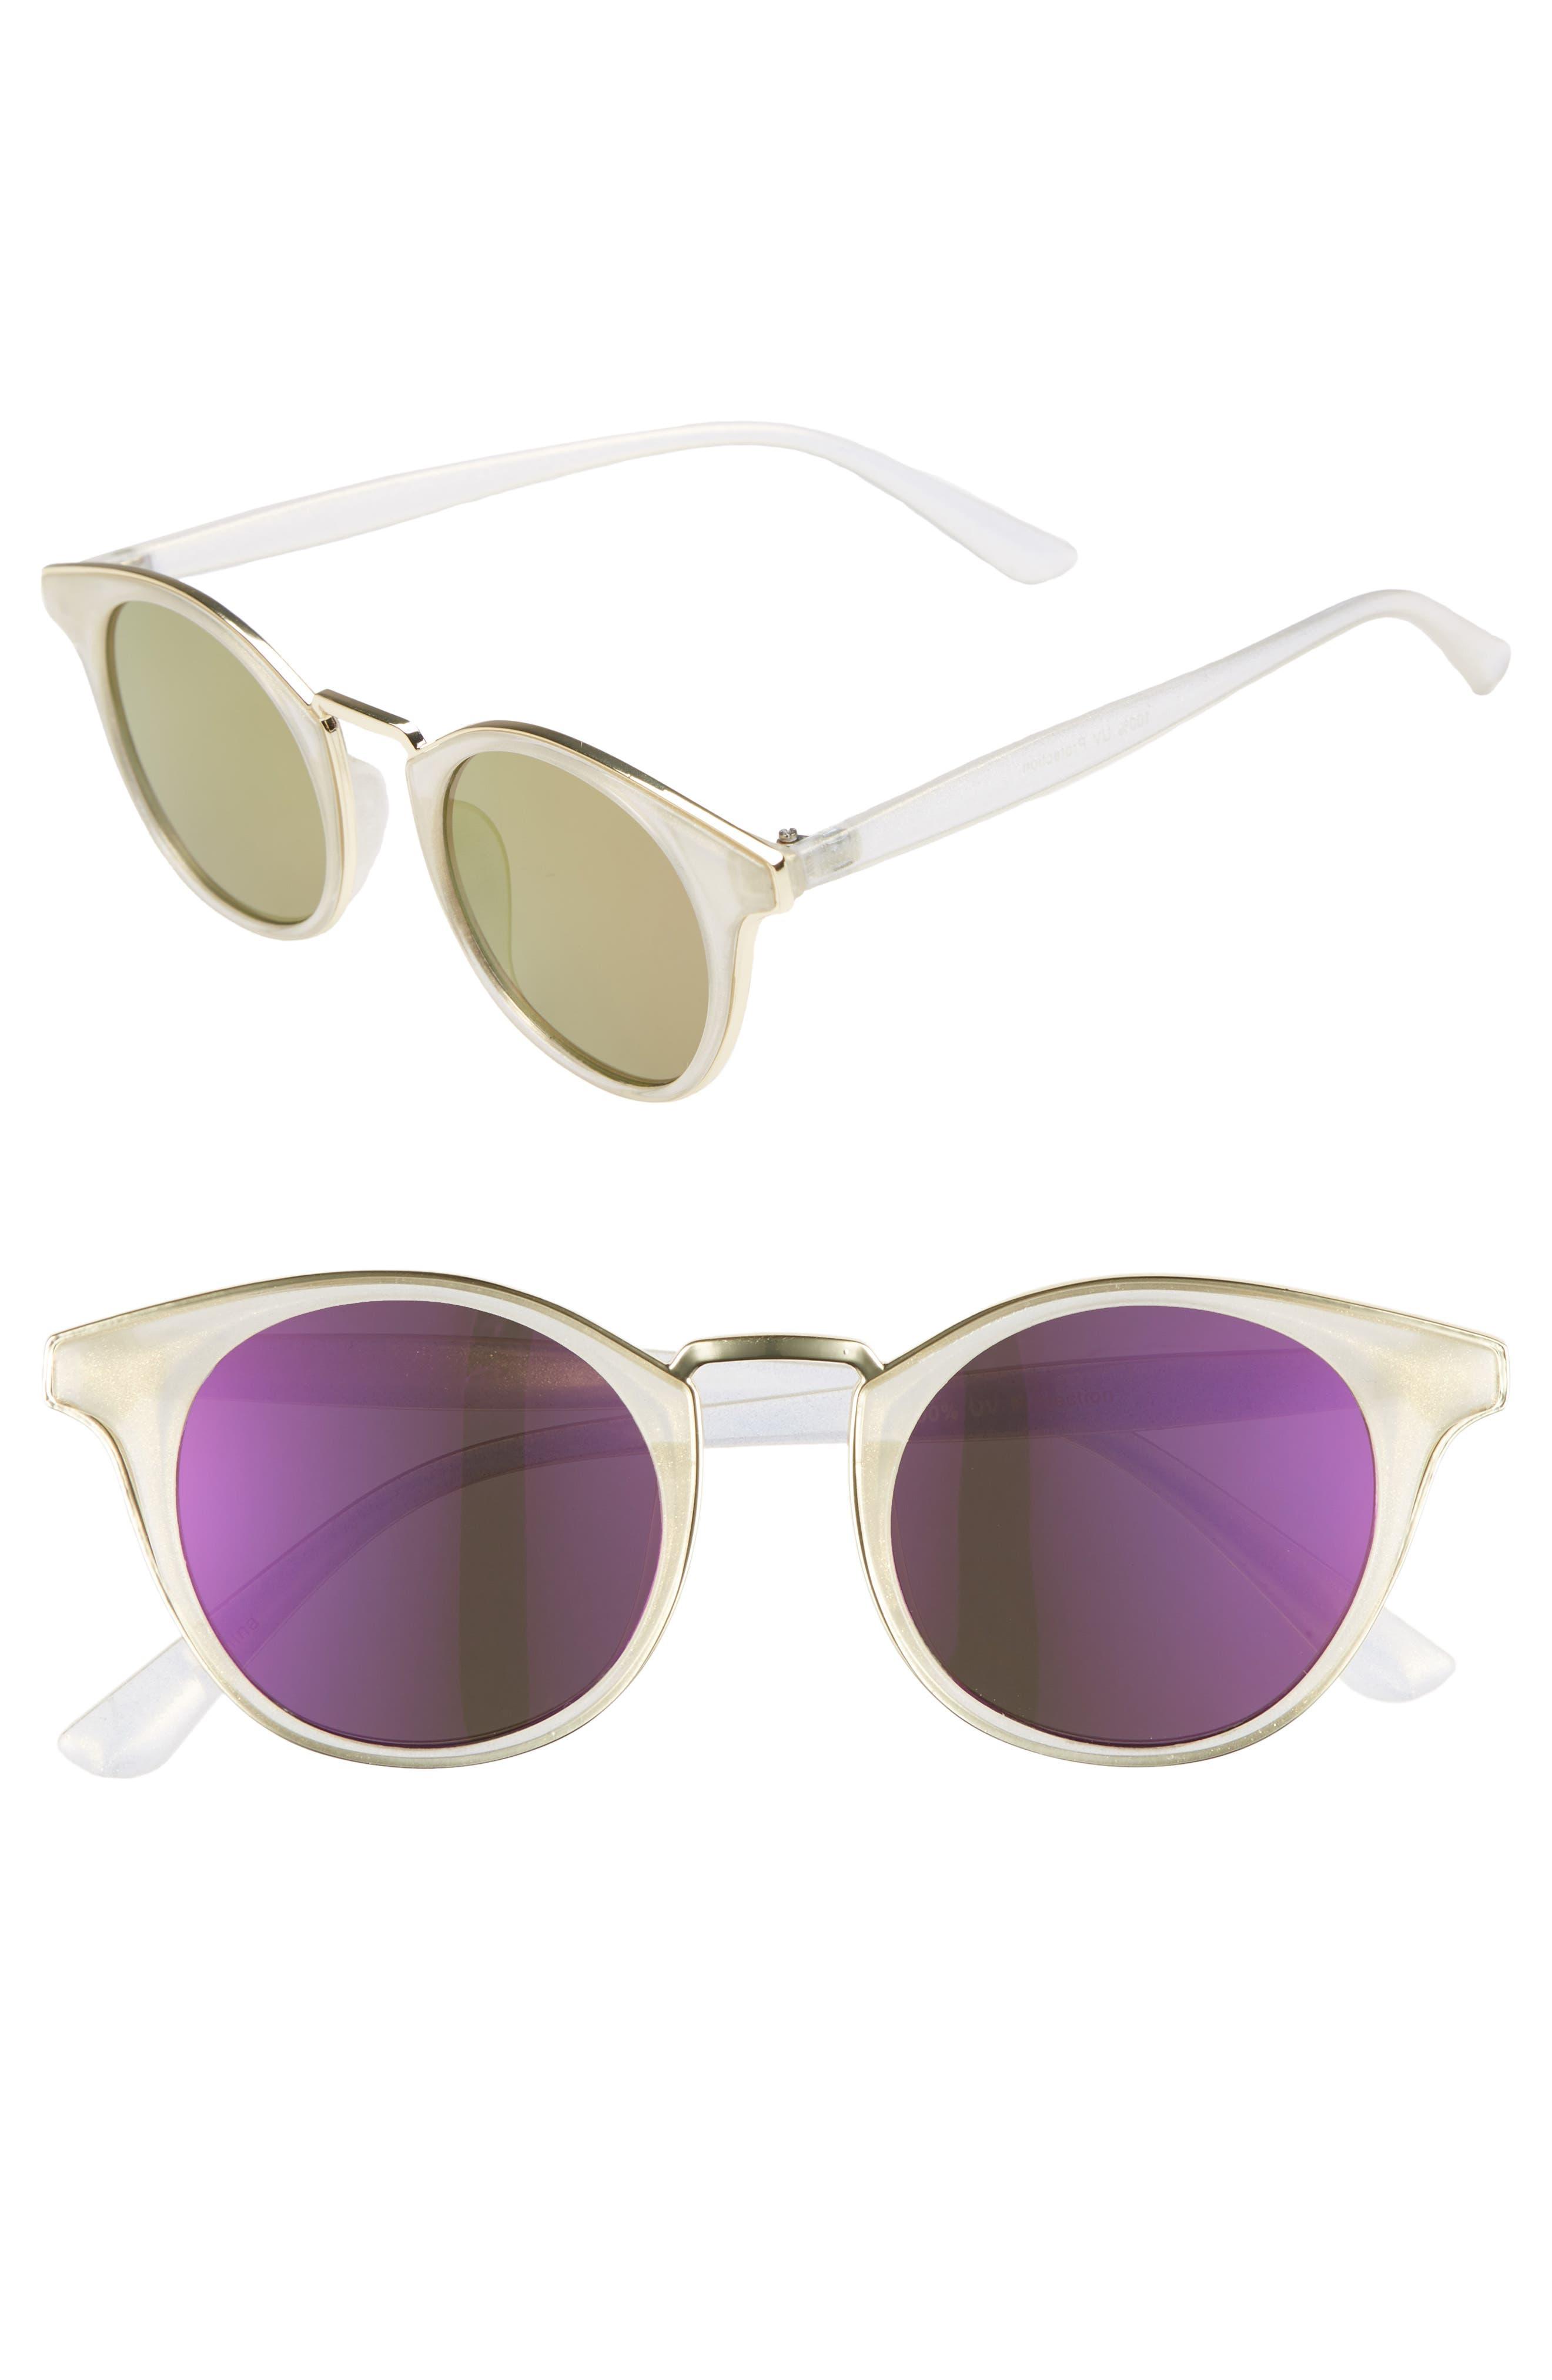 47mm Metal Trim Round Sunglasses,                             Main thumbnail 1, color,                             Clear/ Blue